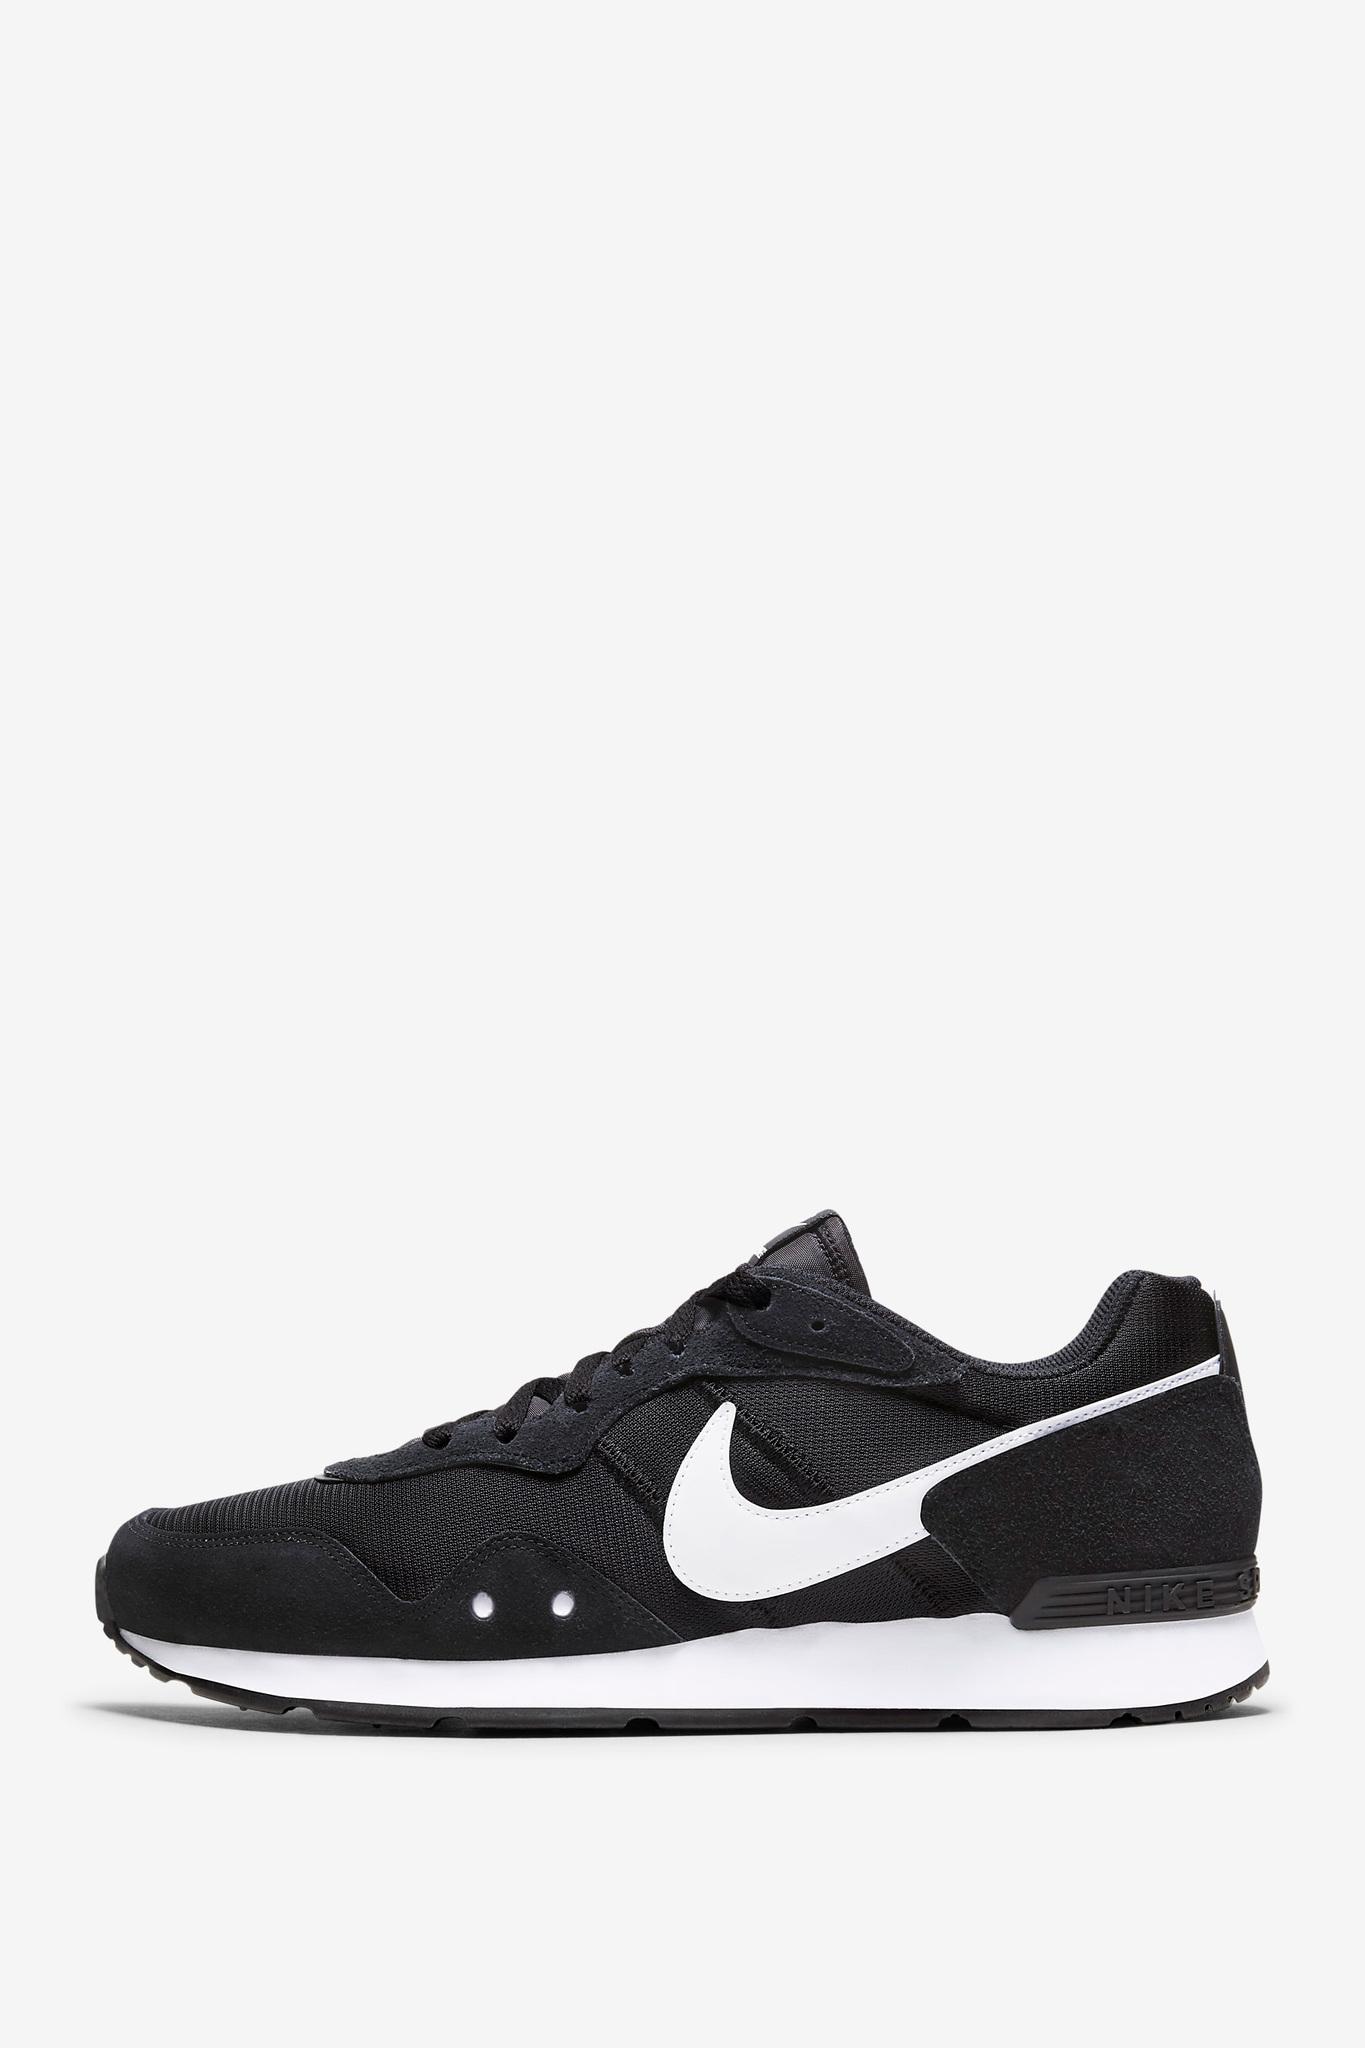 Купить Nike Venture Runner CK2944-002 219361700-0123